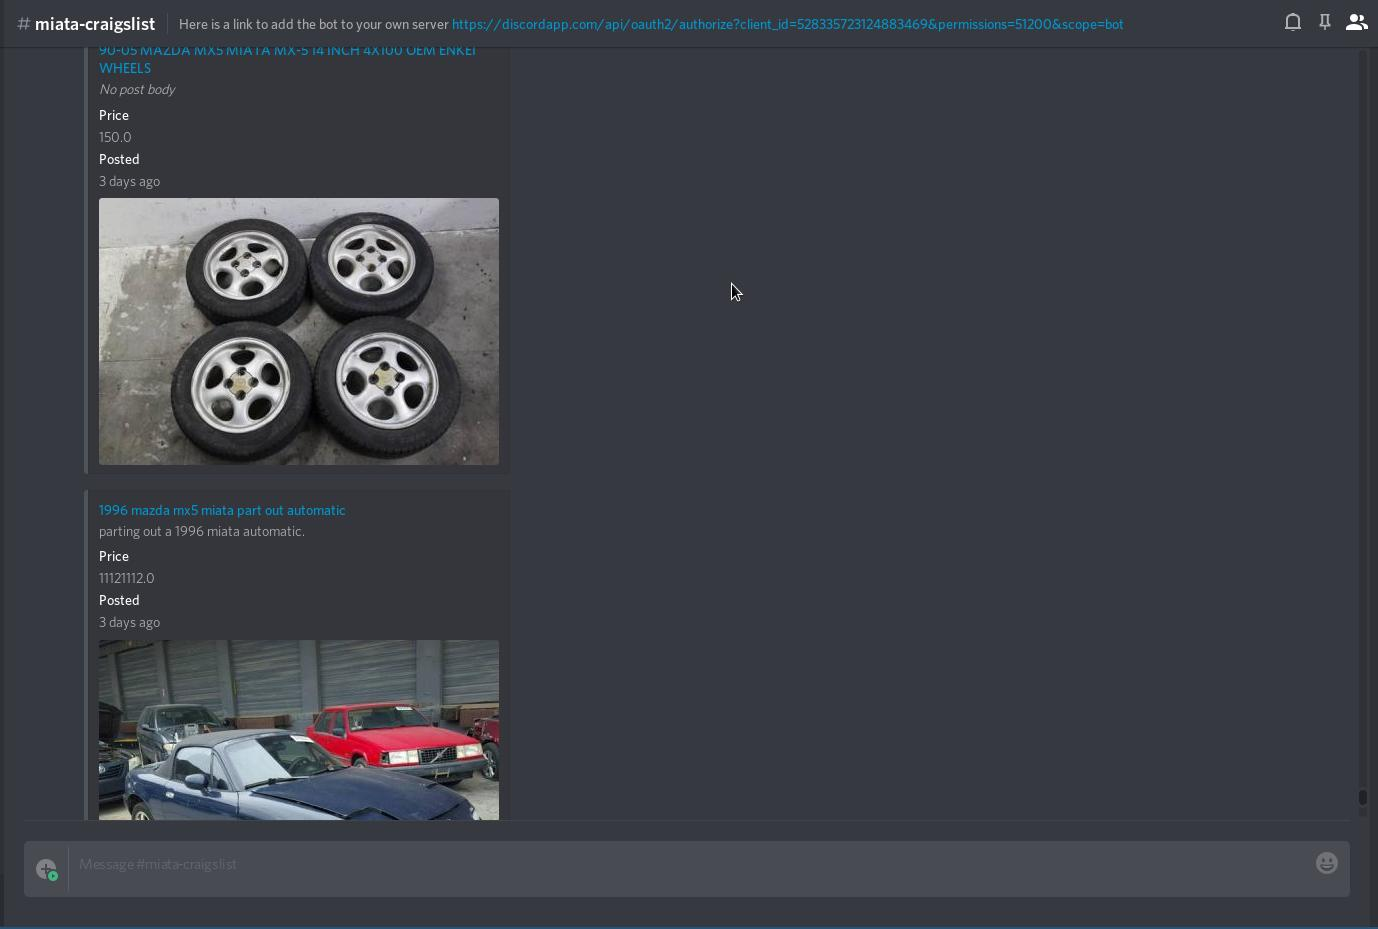 Disclist - A Discord bot to scrape Craigslist - Projects - Elixir Forum